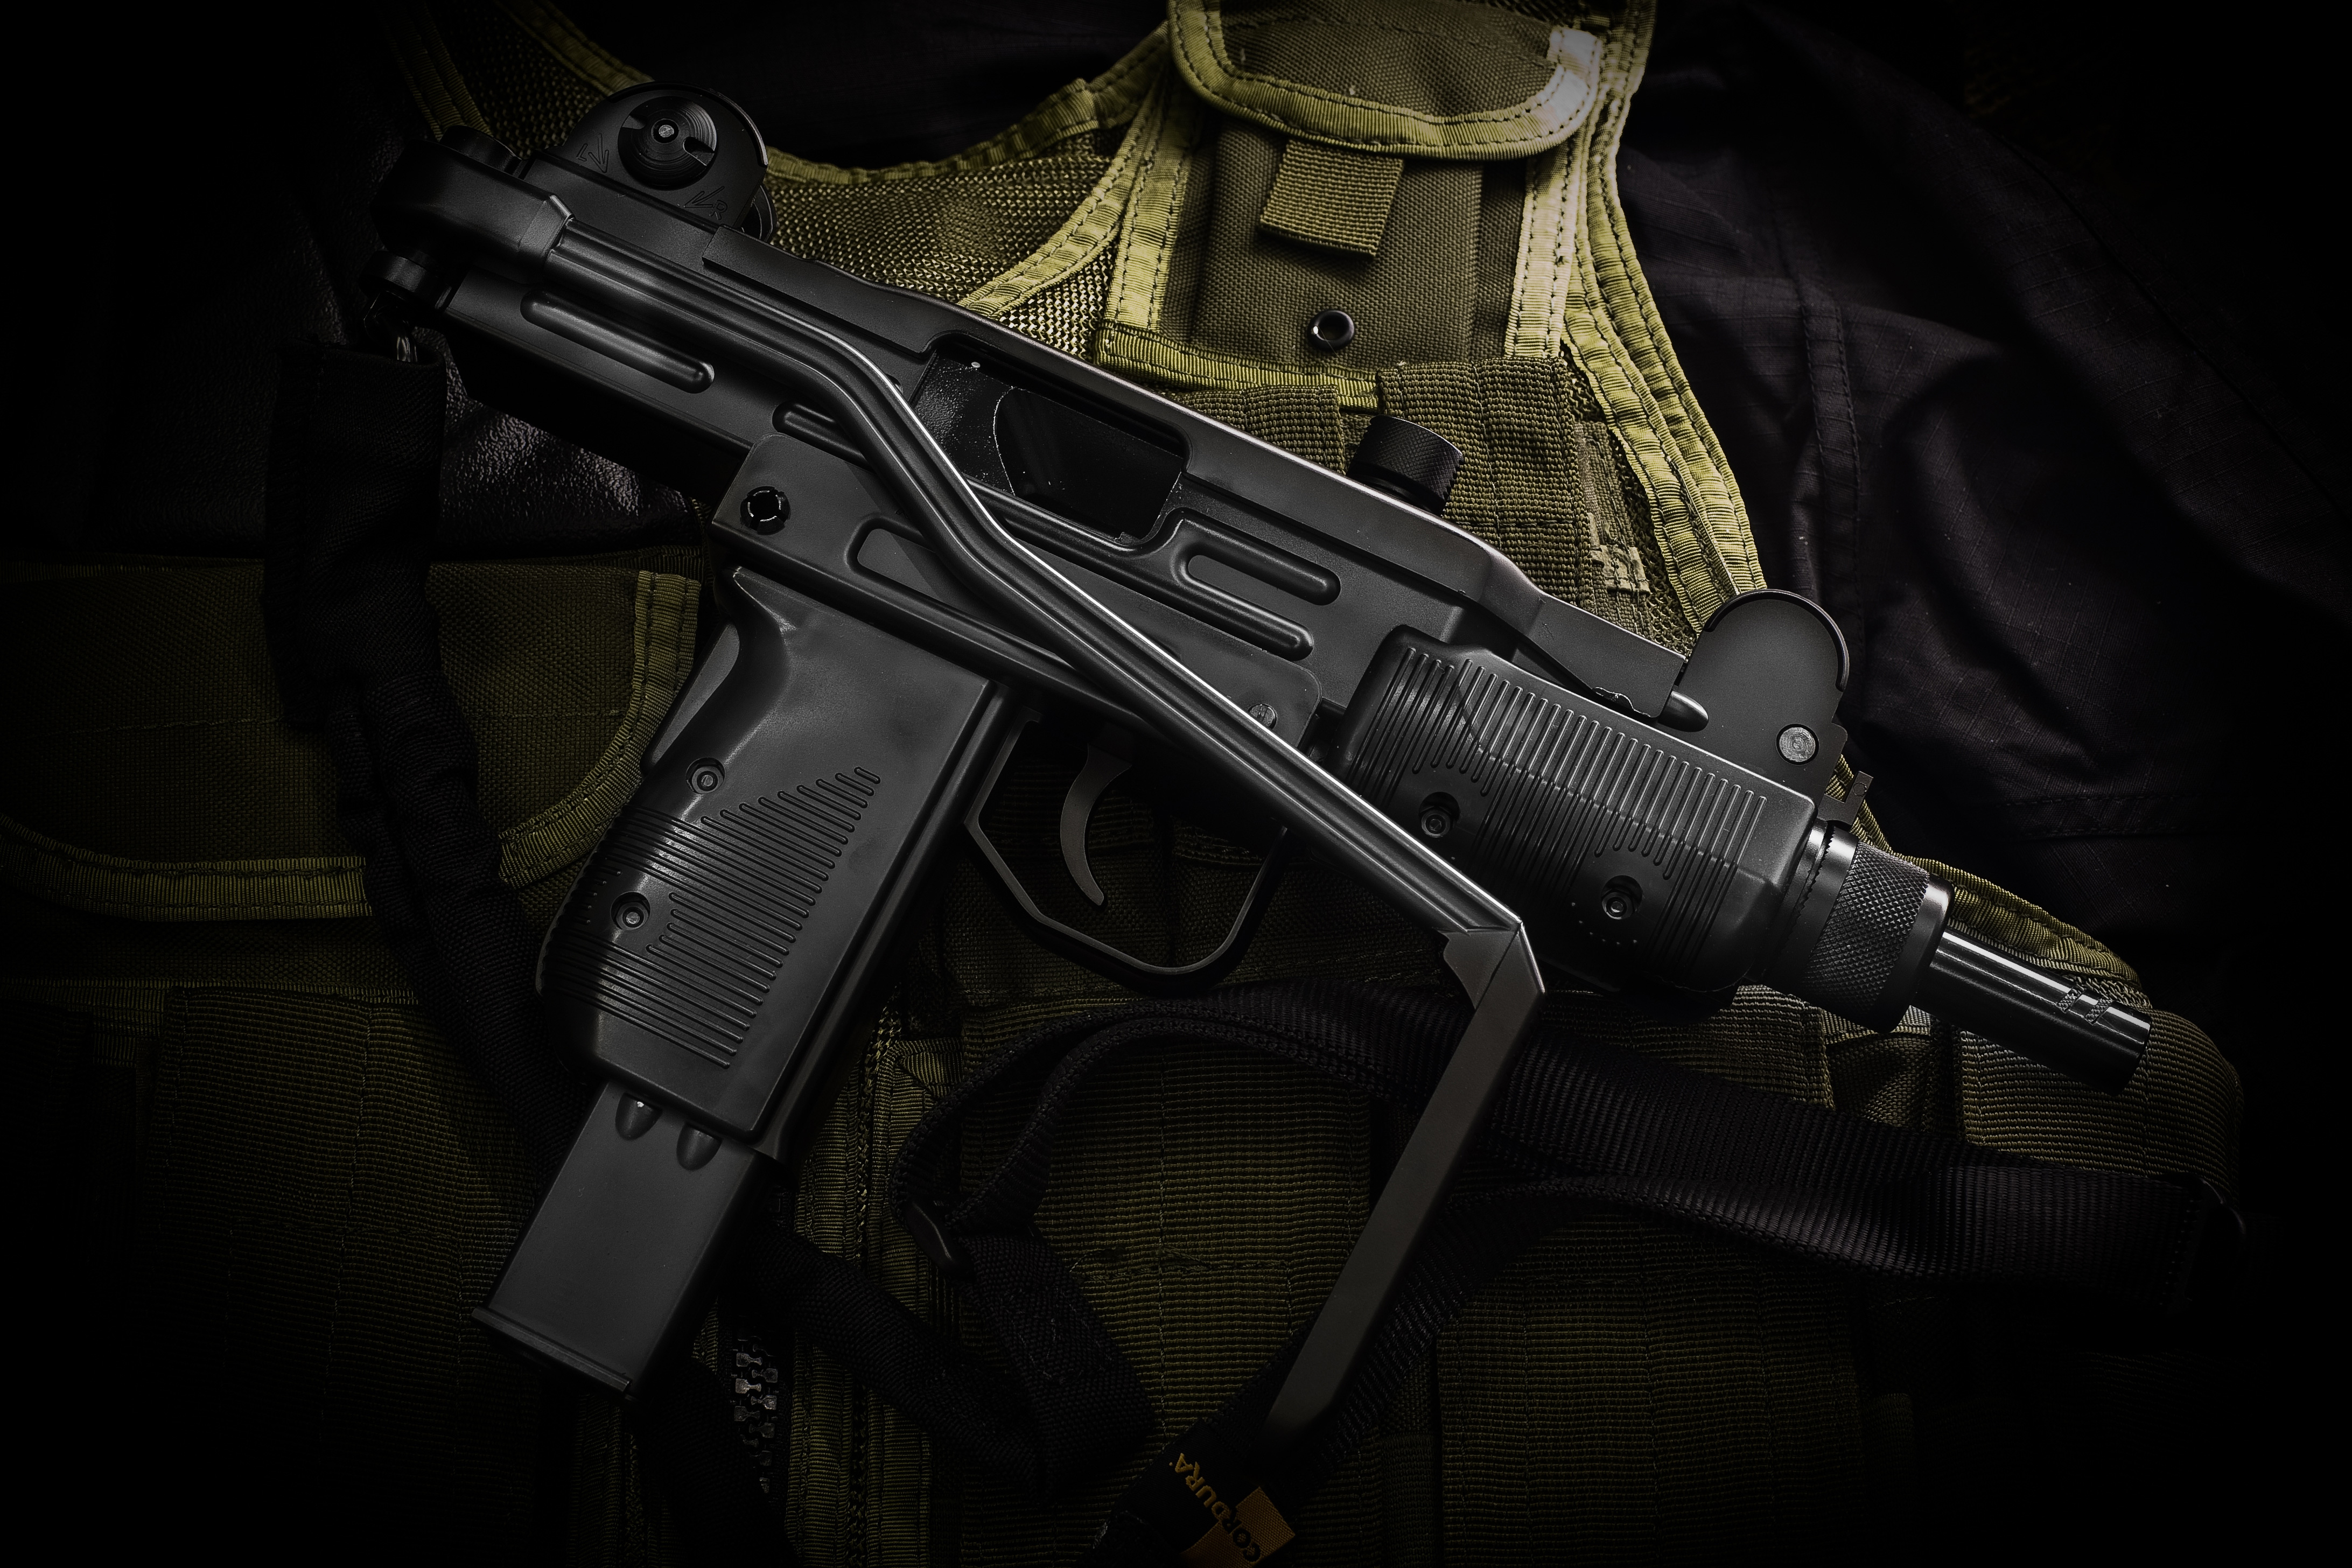 Wallpaper sub machine gun uzi 171uziquot guns wallpapers 1680x1050